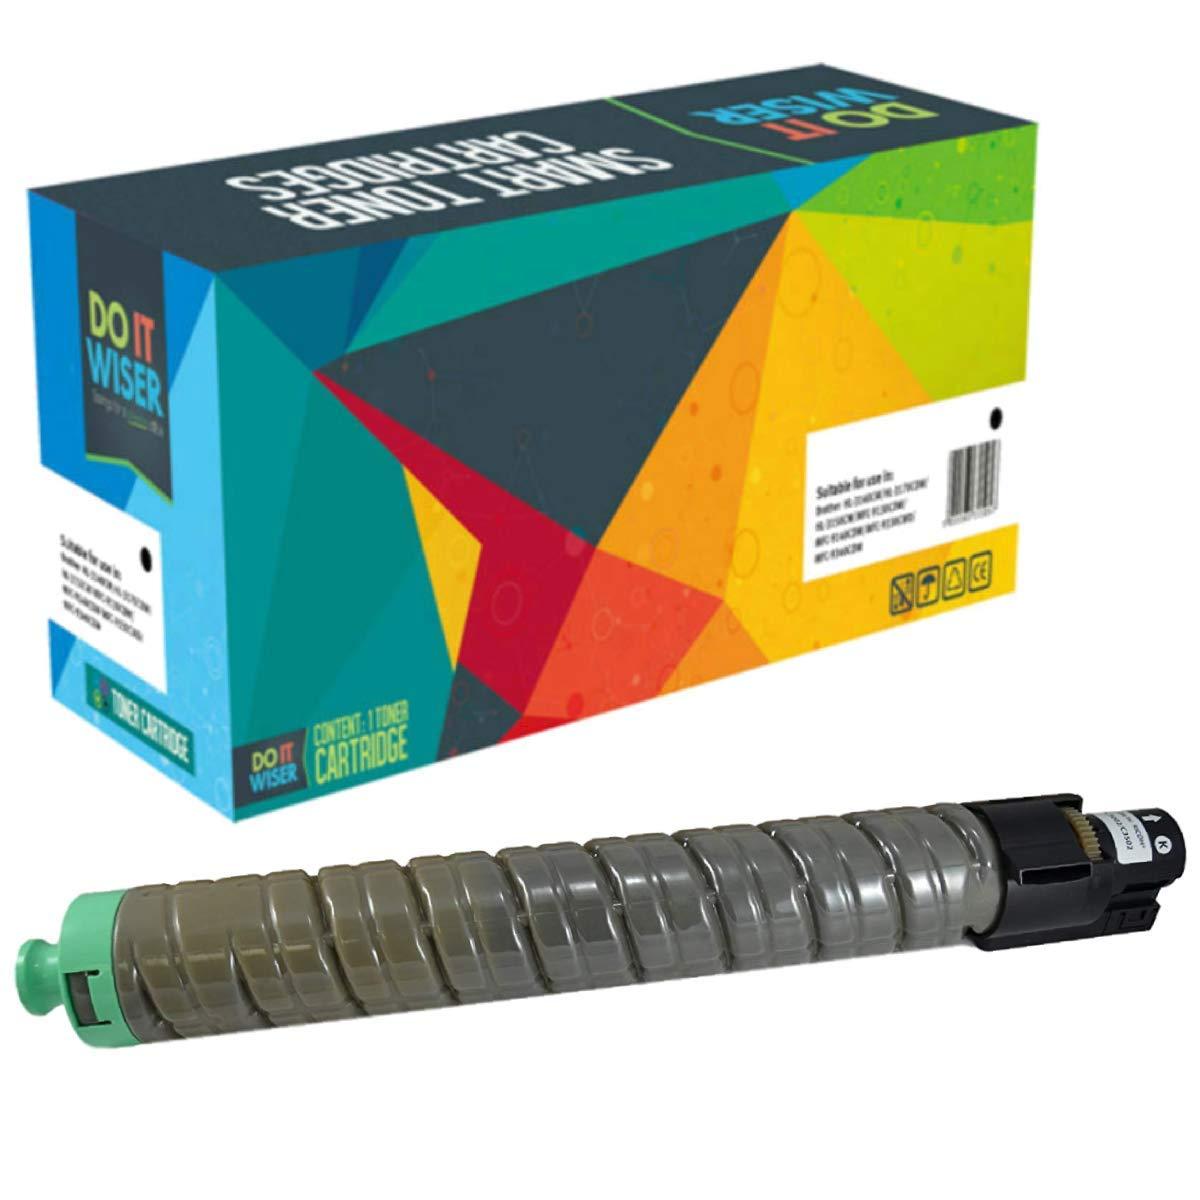 Toner Alternativo ( X1 ) Negro C3502 C3002-841735 28000-Paginas